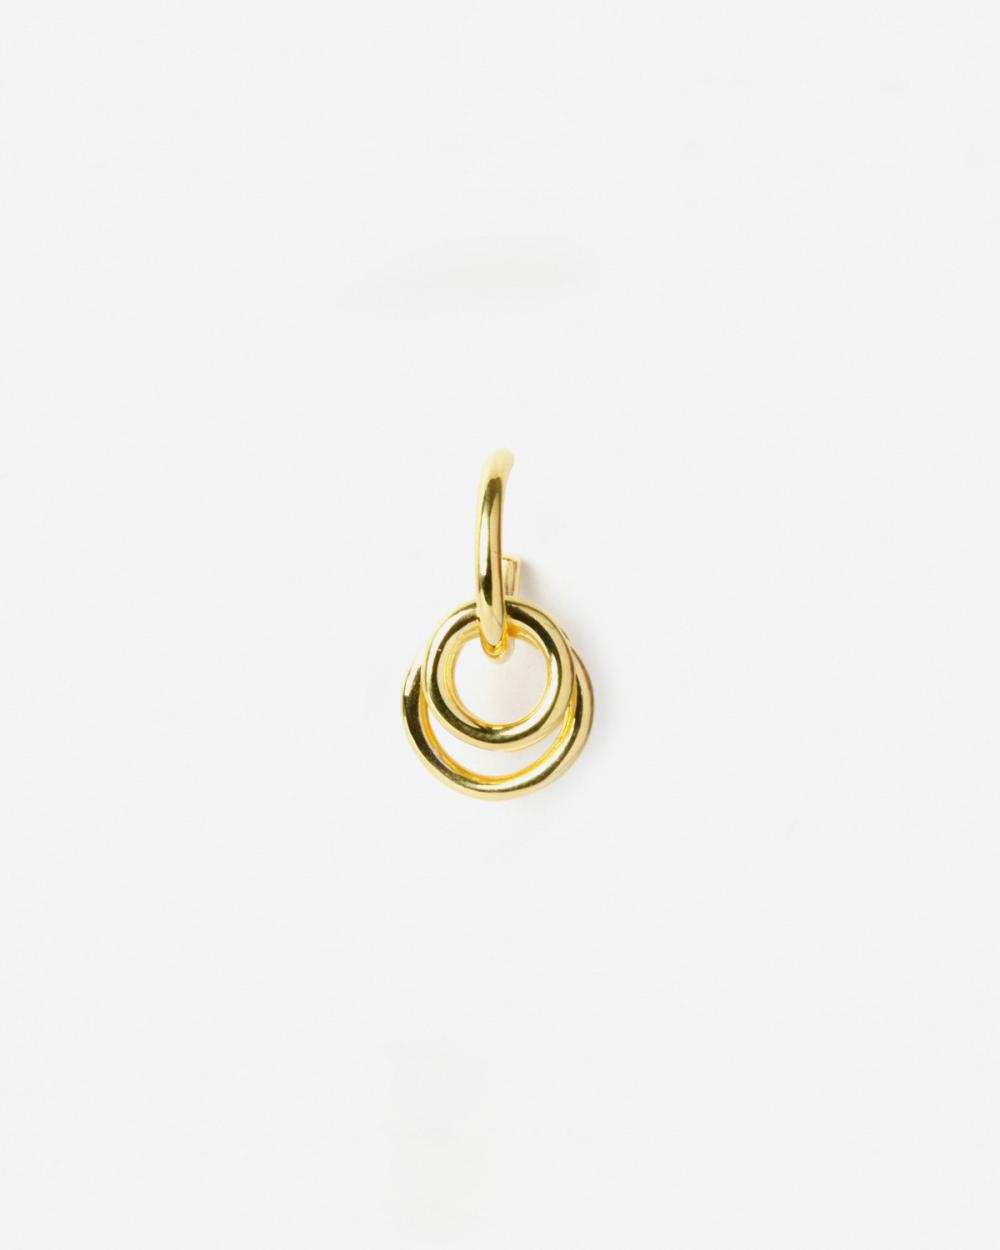 Earrings YELLOW GOLD TAU SINGLE EARRING NOVE25